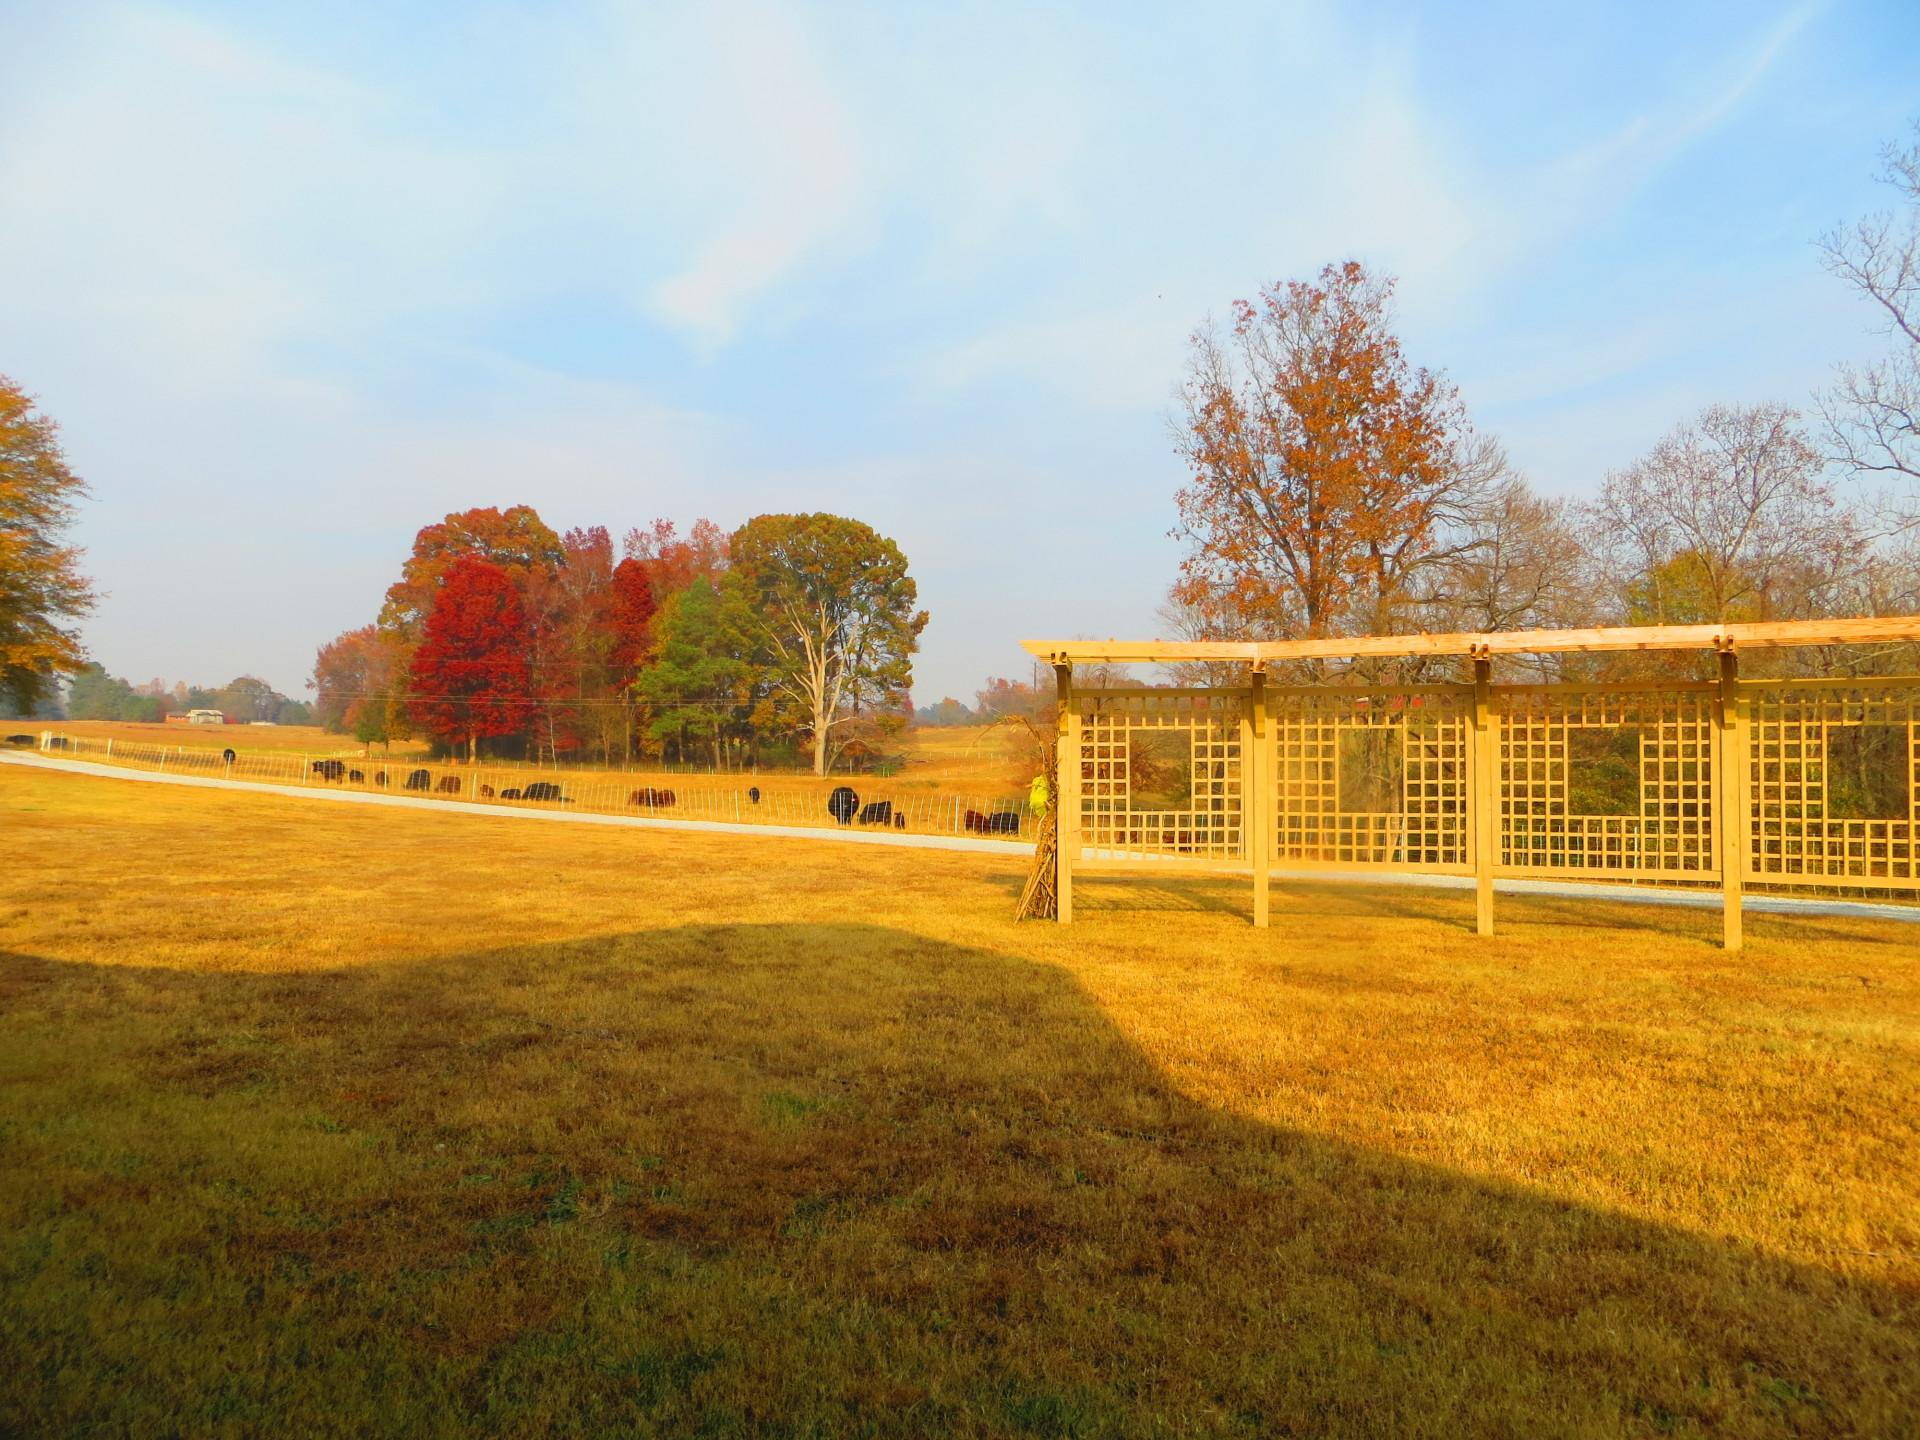 Wedding Lawn in Fall